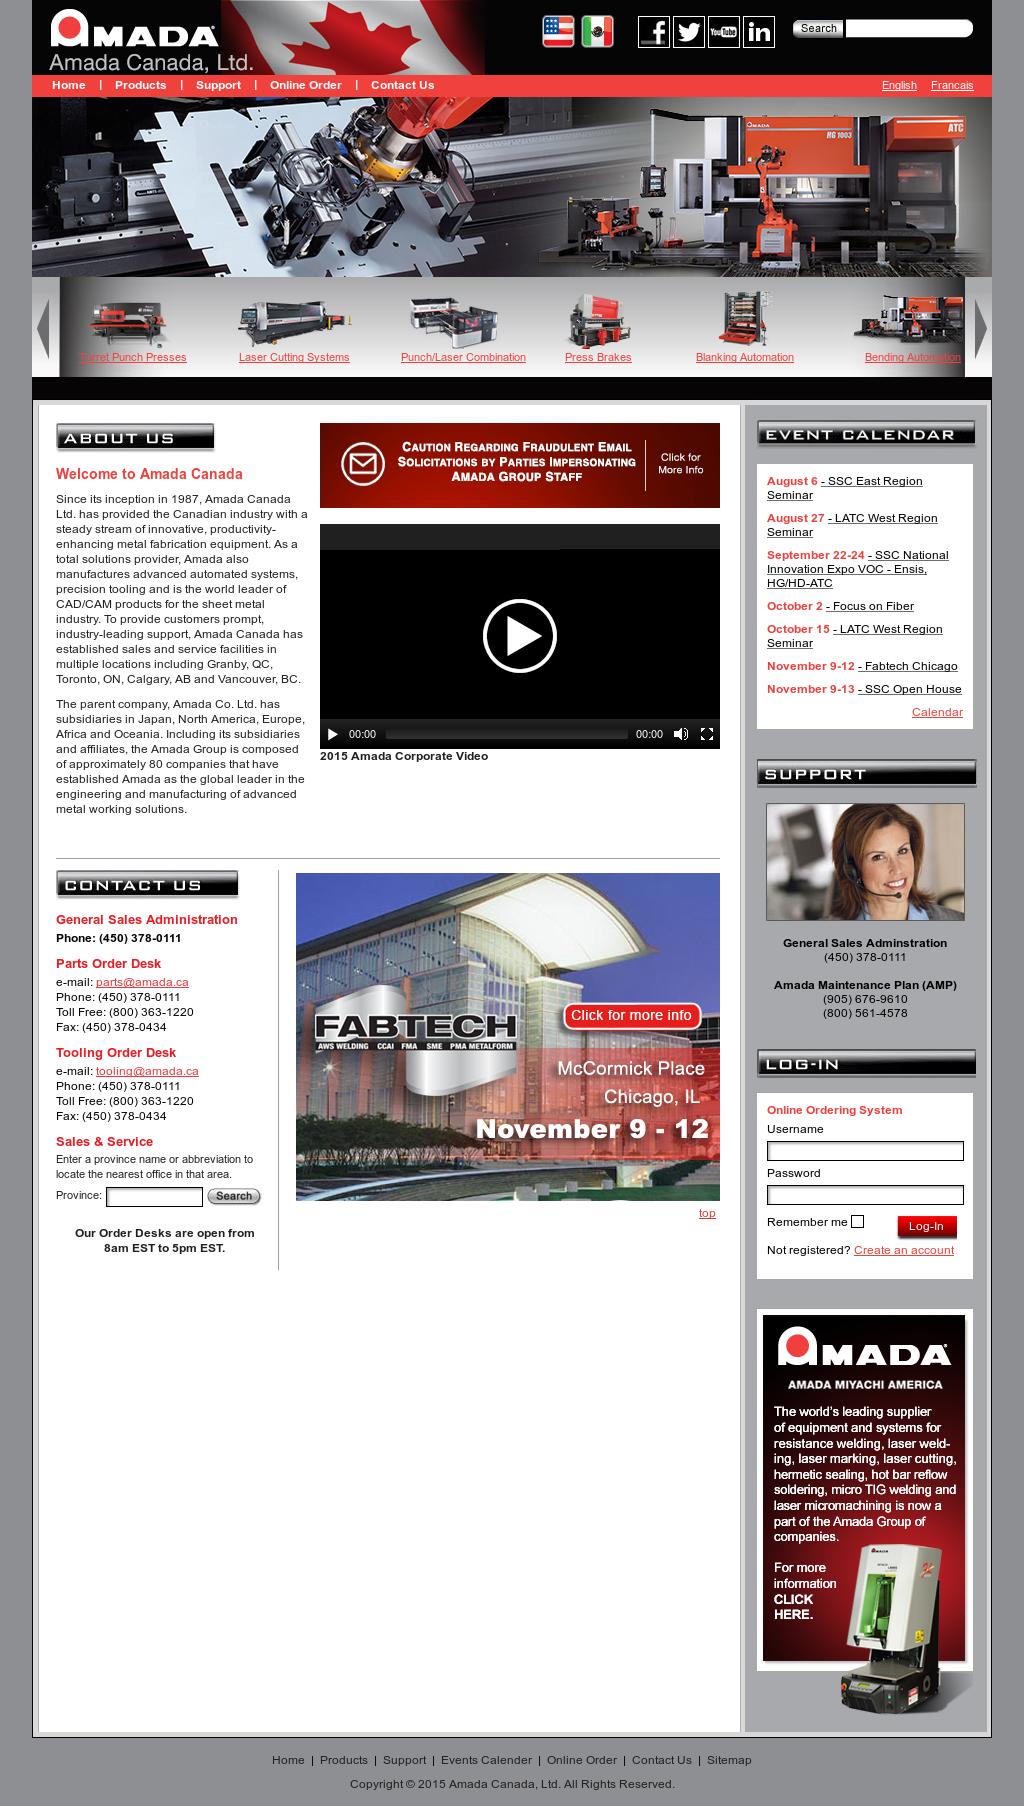 Amada Competitors, Revenue and Employees - Owler Company Profile